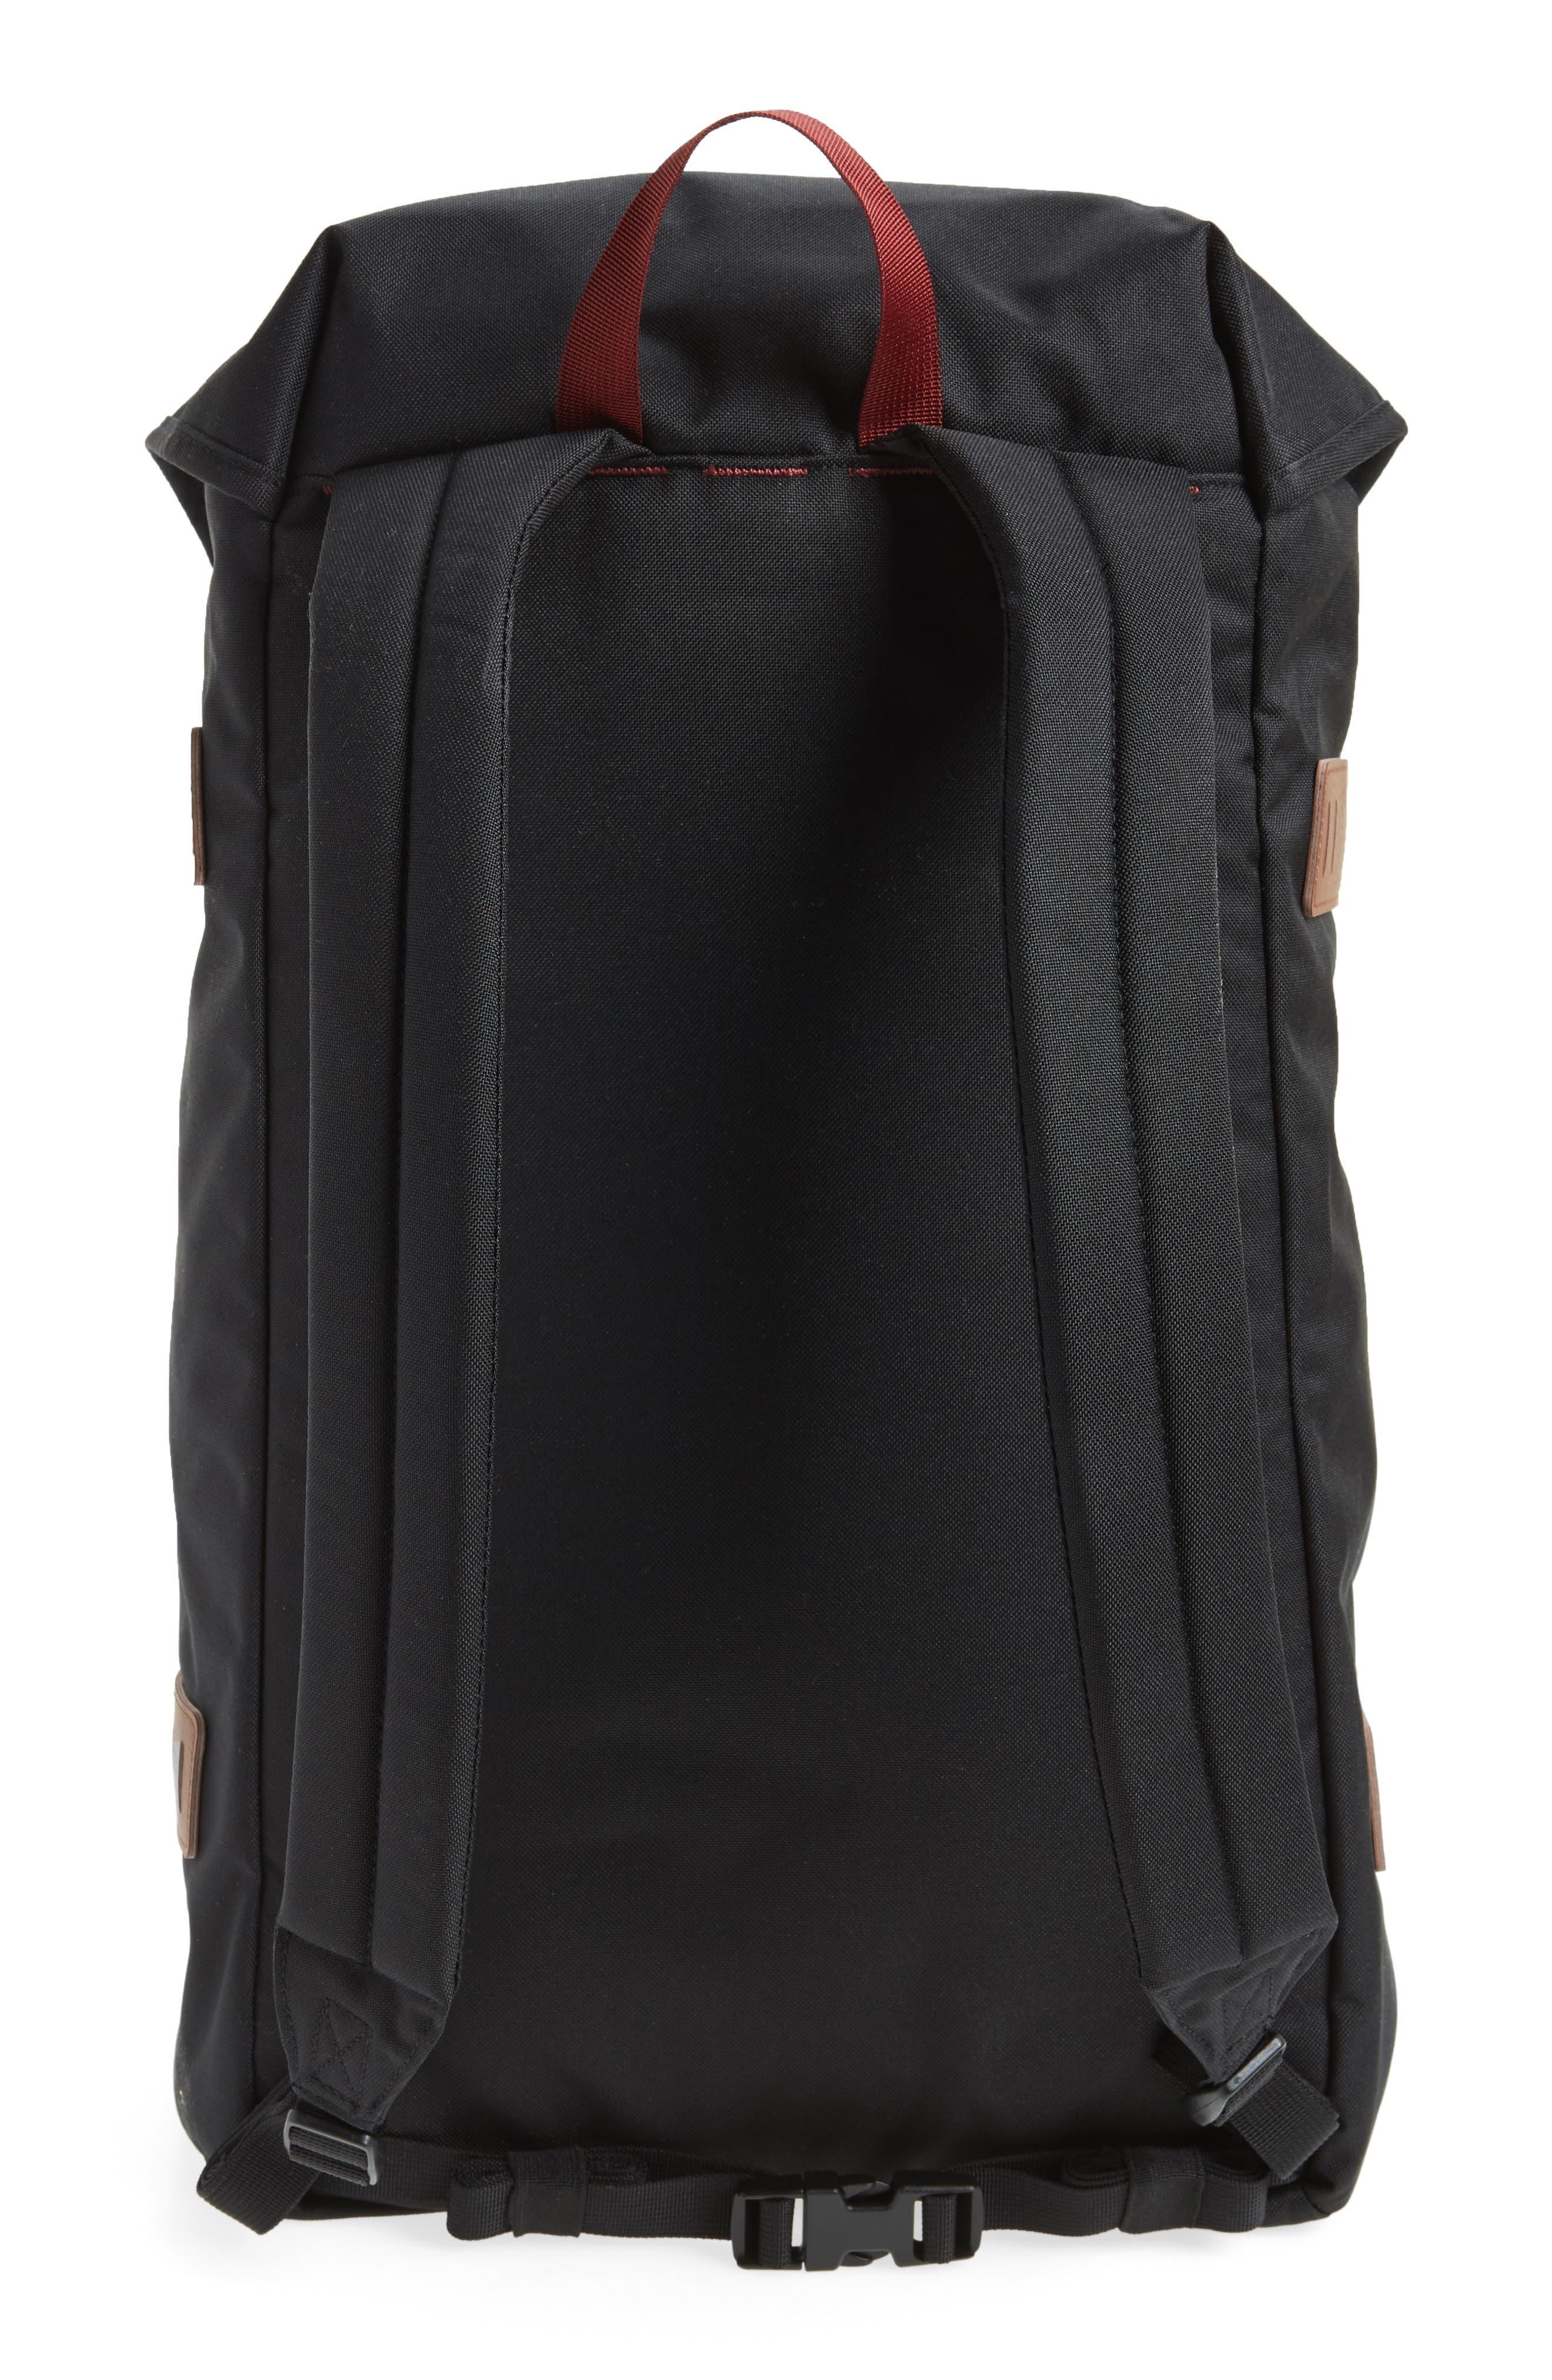 PATAGONIA, Arbor 26-Liter Backpack, Alternate thumbnail 3, color, 001